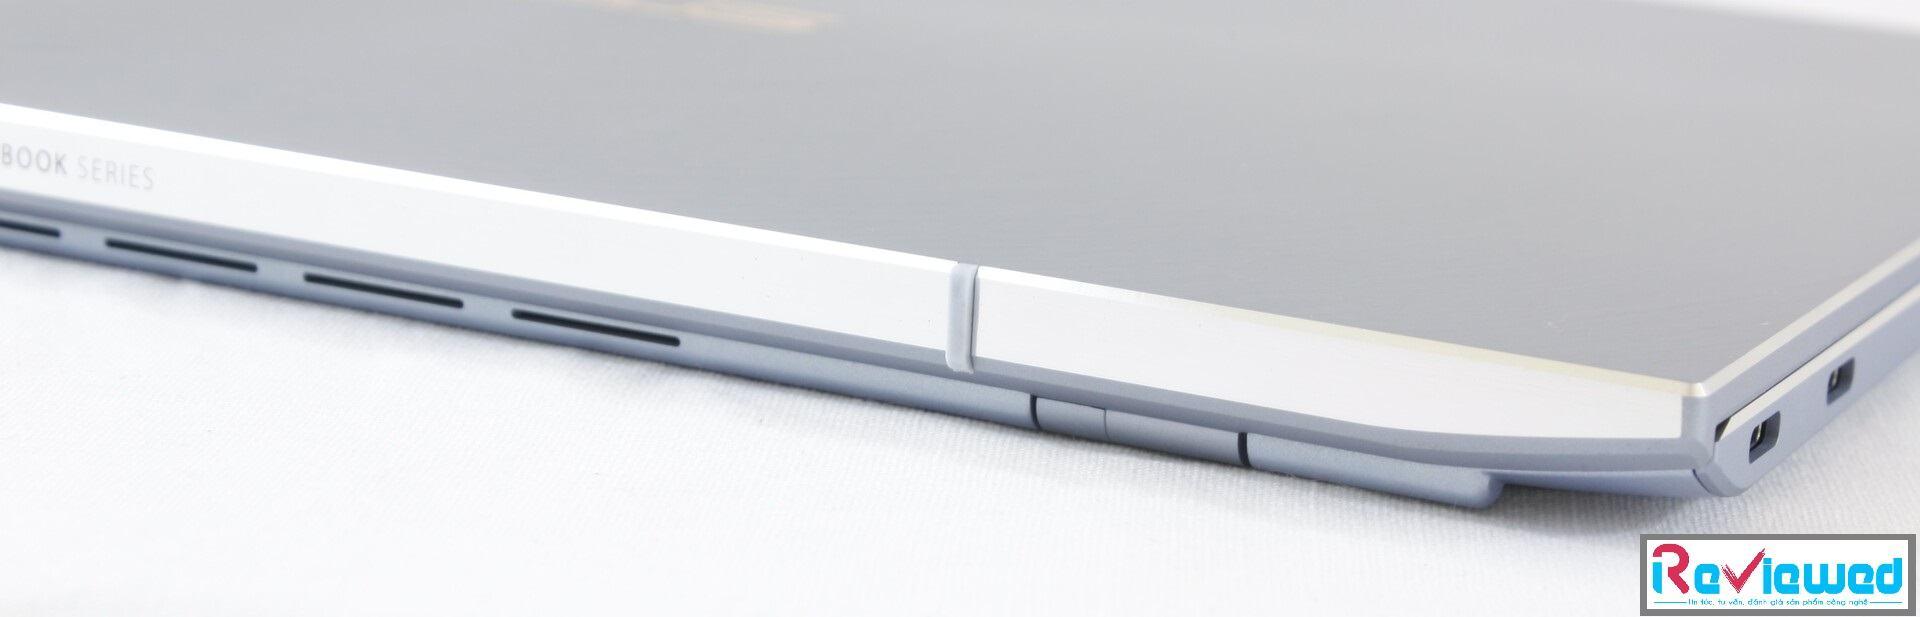 đánh giá laptop Asus ZenBook S13 UX392FN